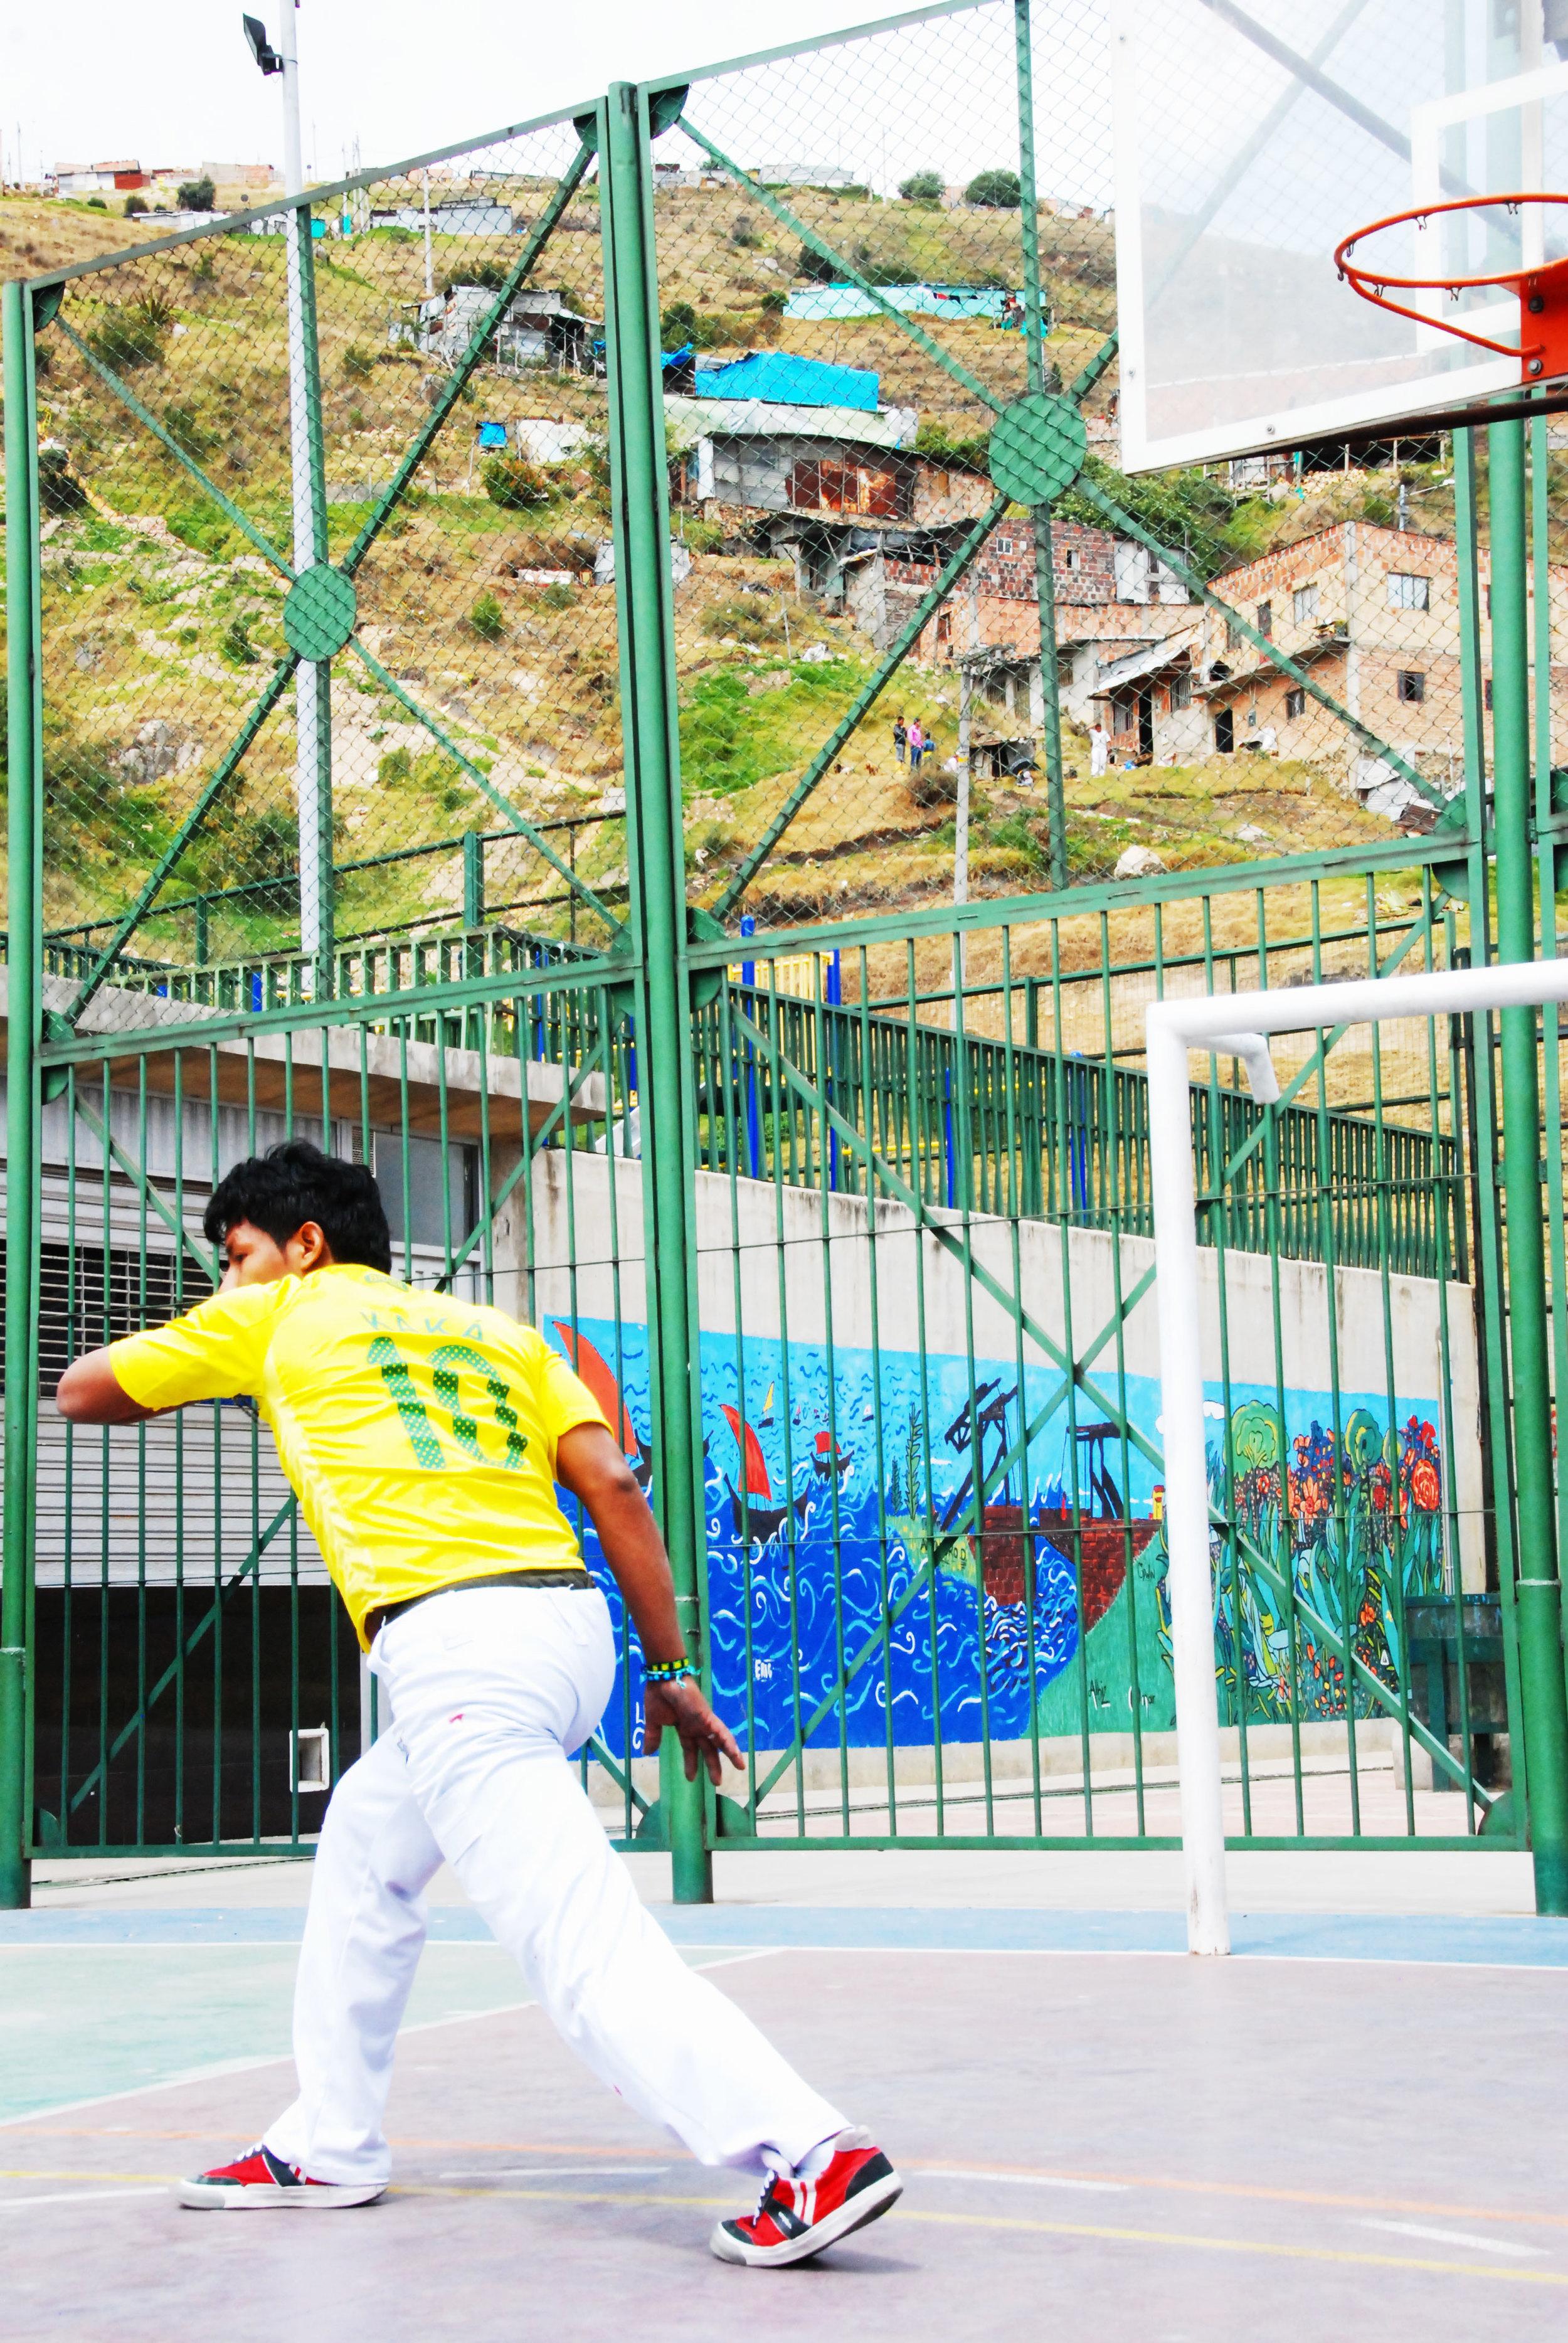 Capoeira in the hills of Ciudad Bolivar